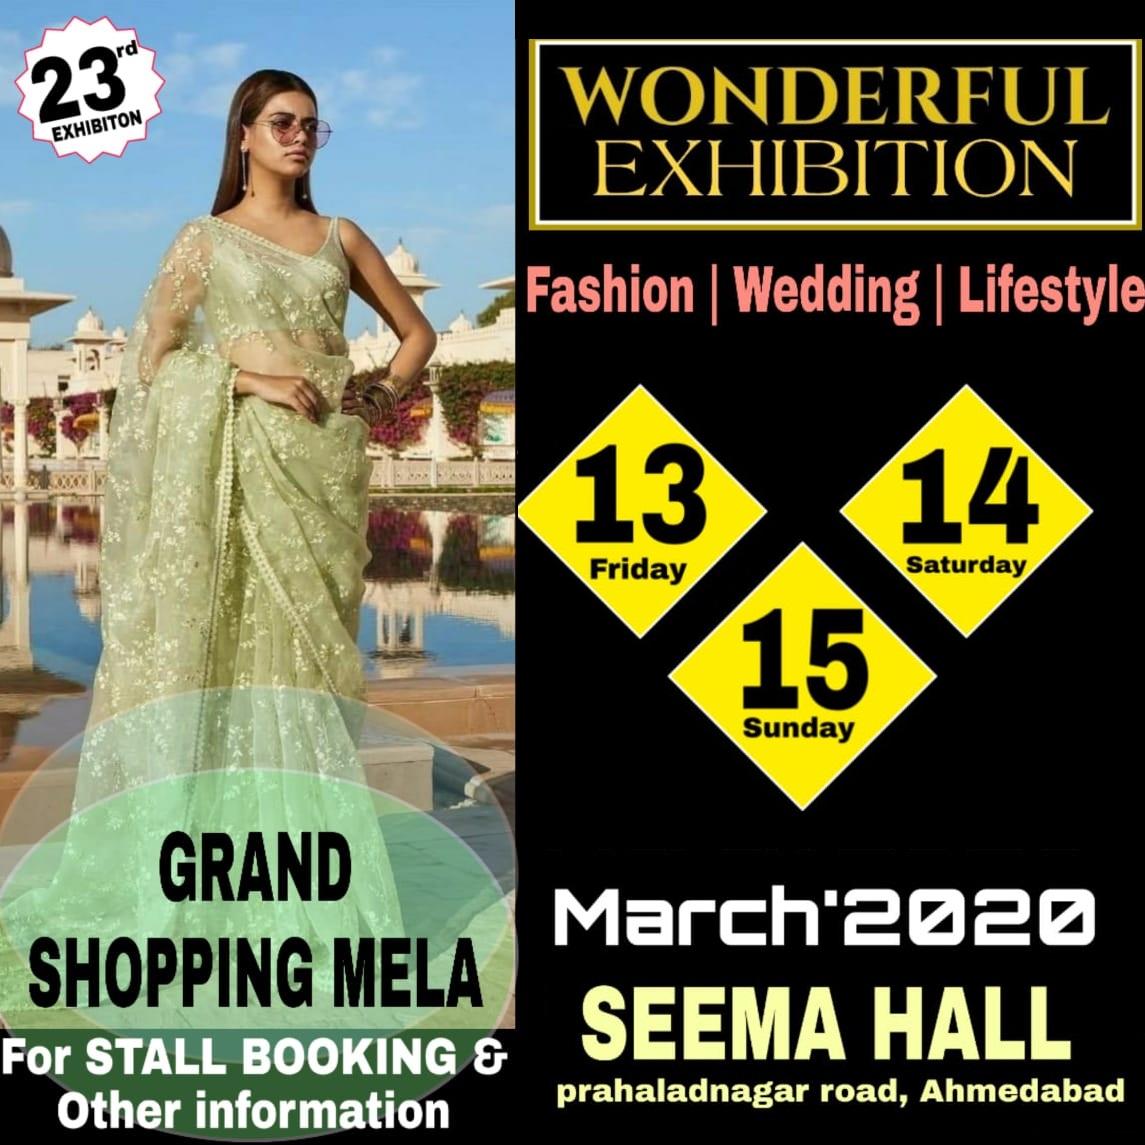 Wonderfull Exhibition